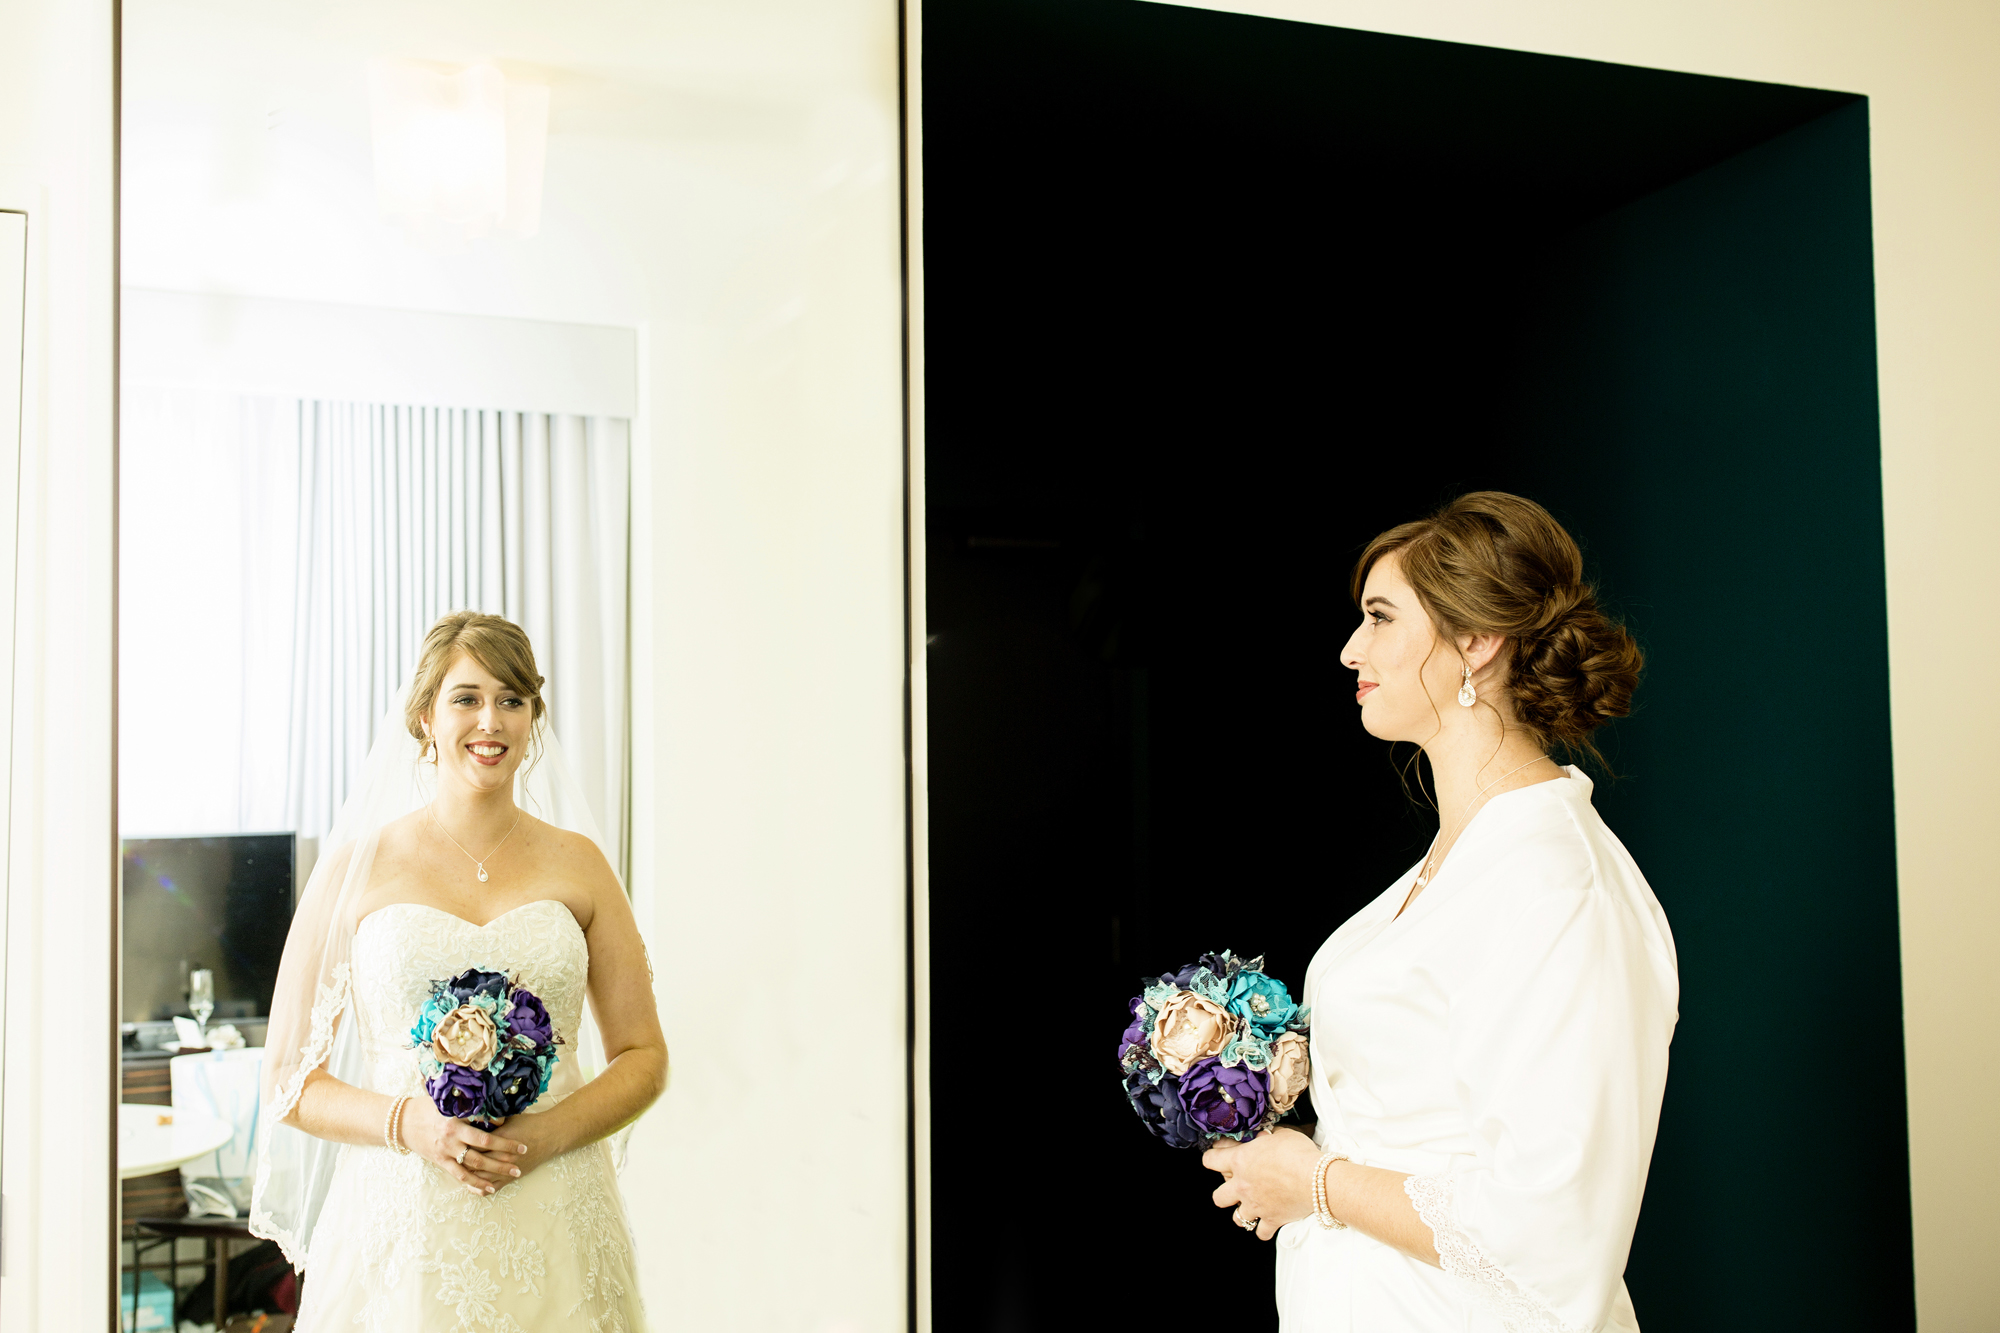 Seriously_Sabrina_Photography_Lexington_Kentucky_21c_Round_Barn_Red_Mile_Wedding_Gorley_31.jpg